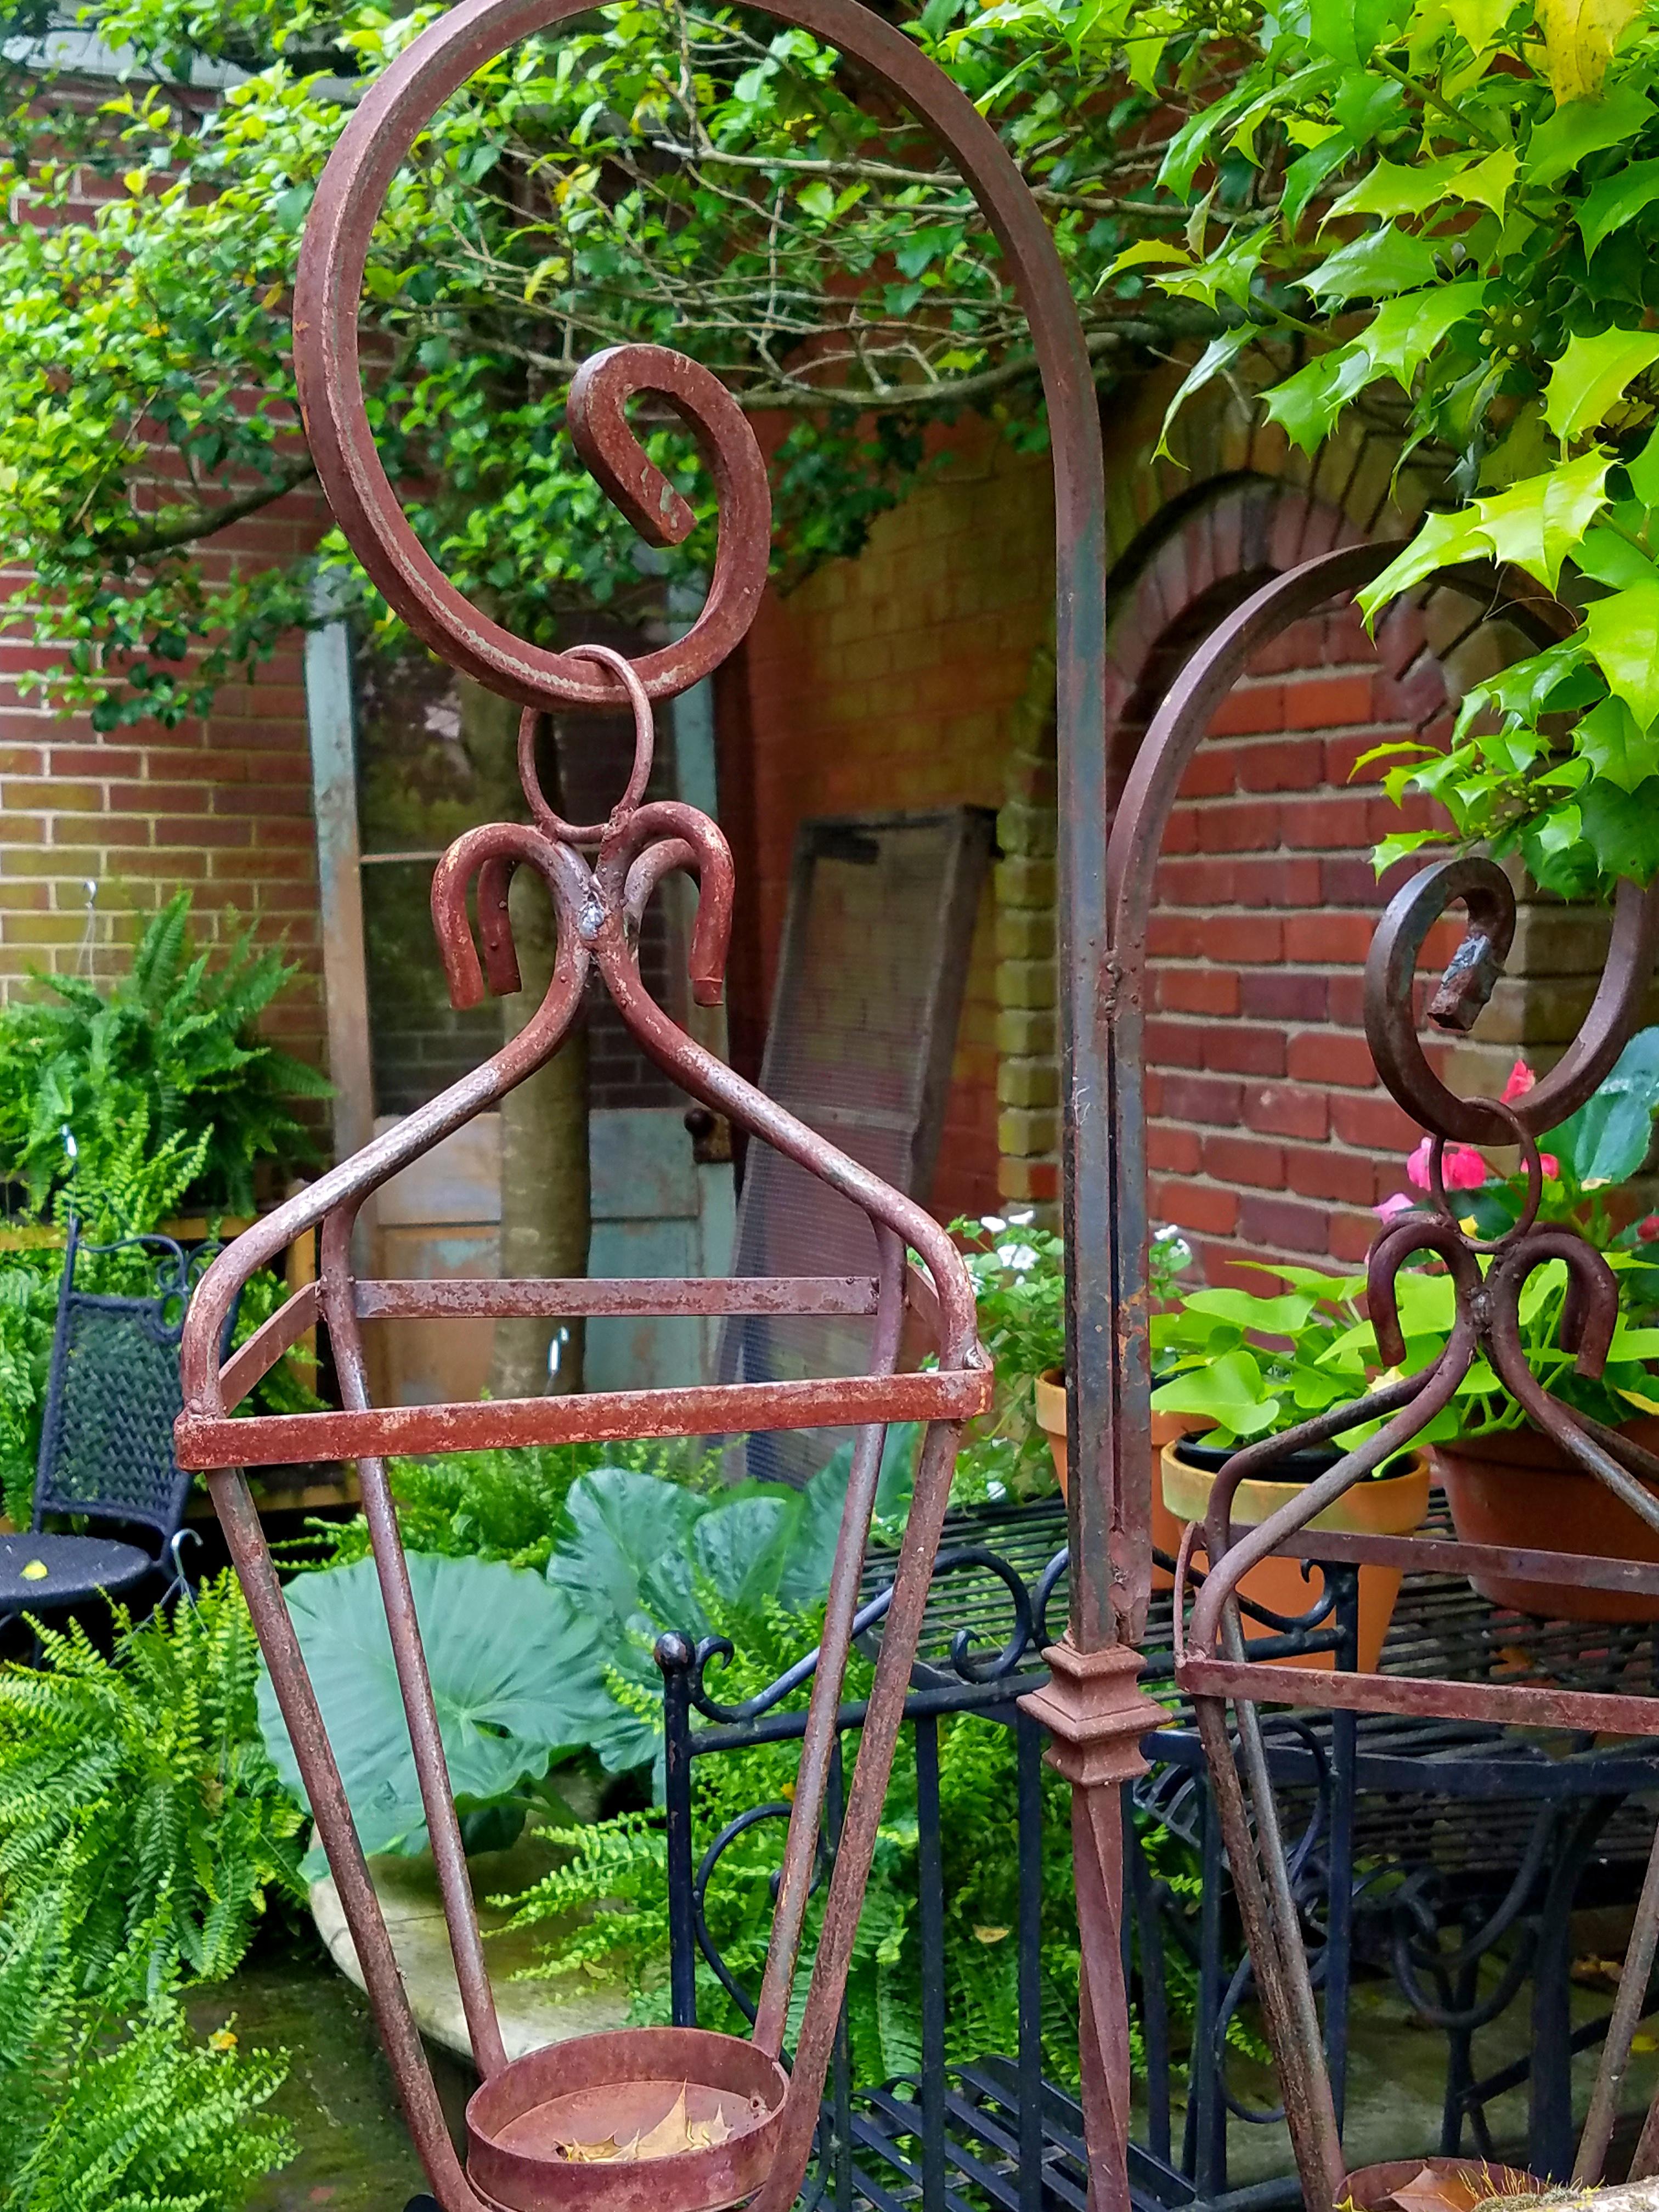 Chippy rusty garden junk vintage shade garden